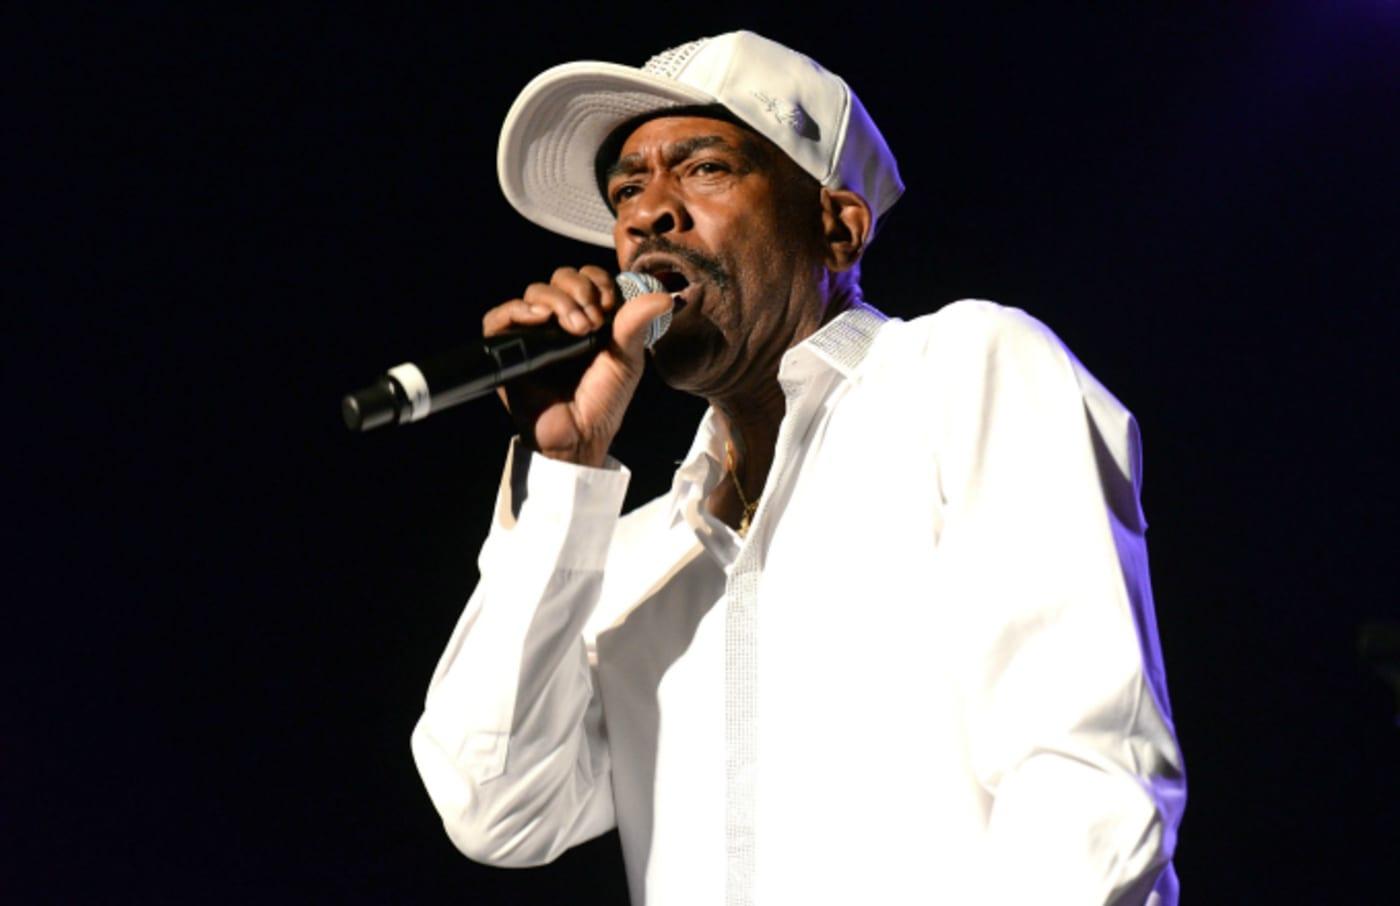 Rapper Kurtis Blow performs onstage